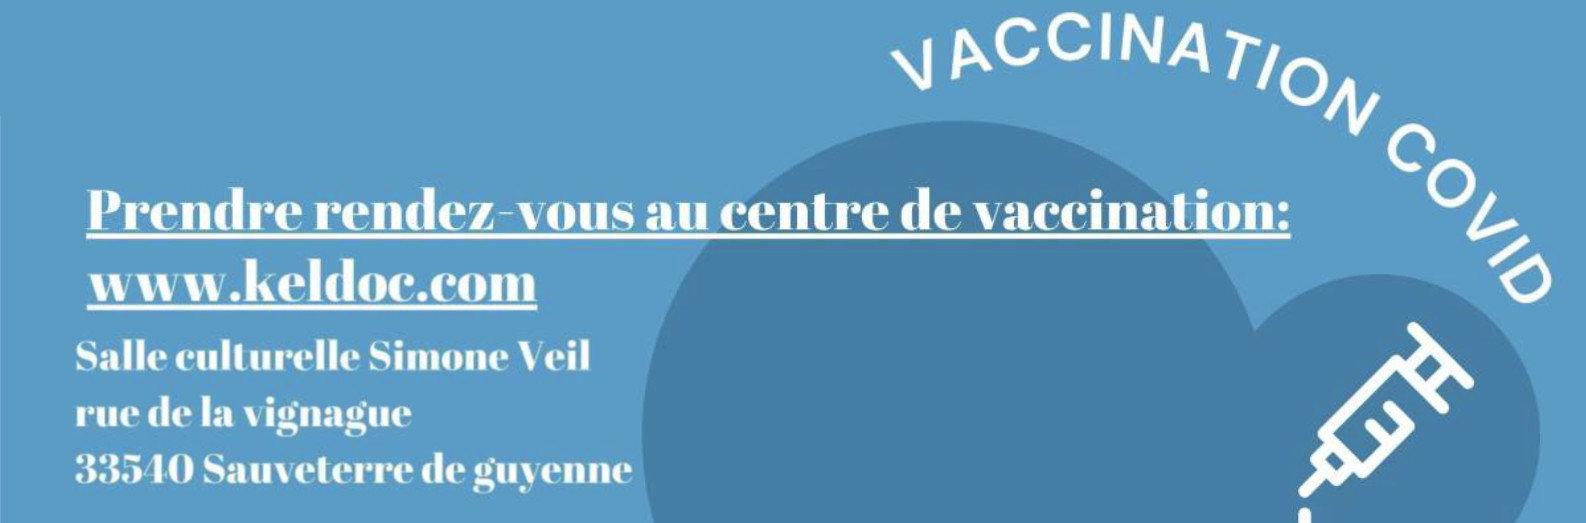 sauveterre vaccination